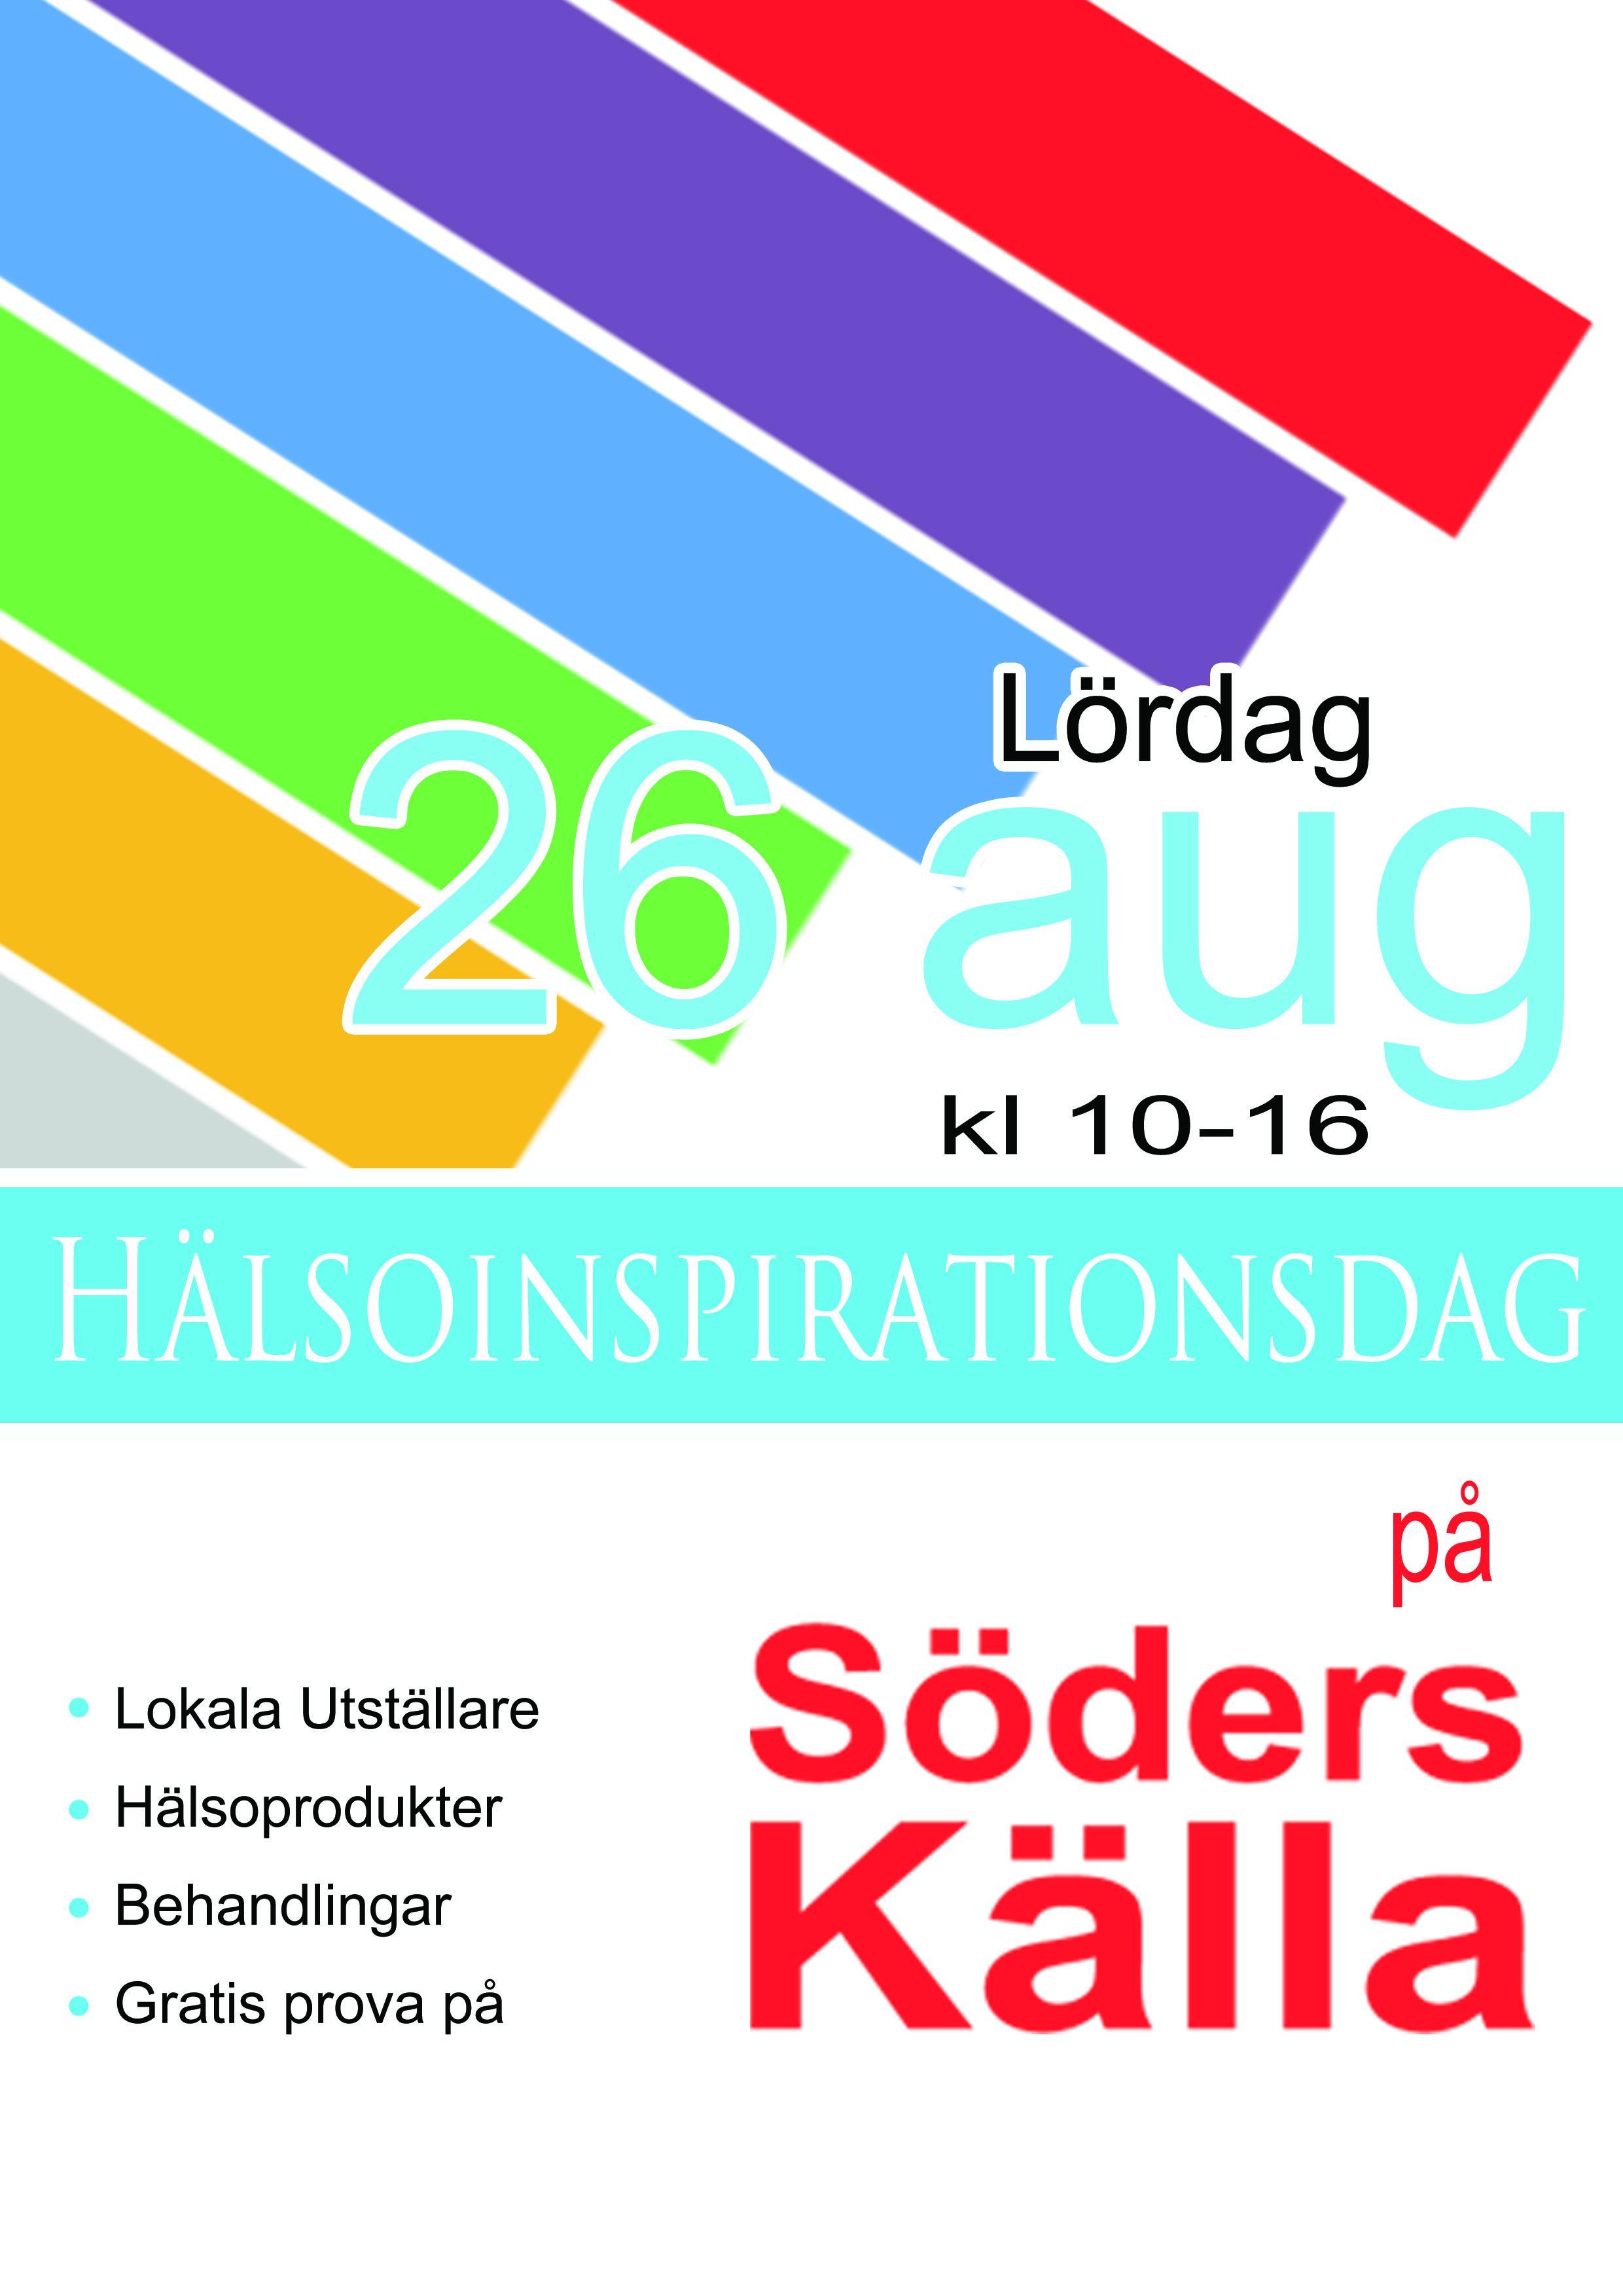 © Sabah Ingvarsson, Hälsoinspirationsdagen